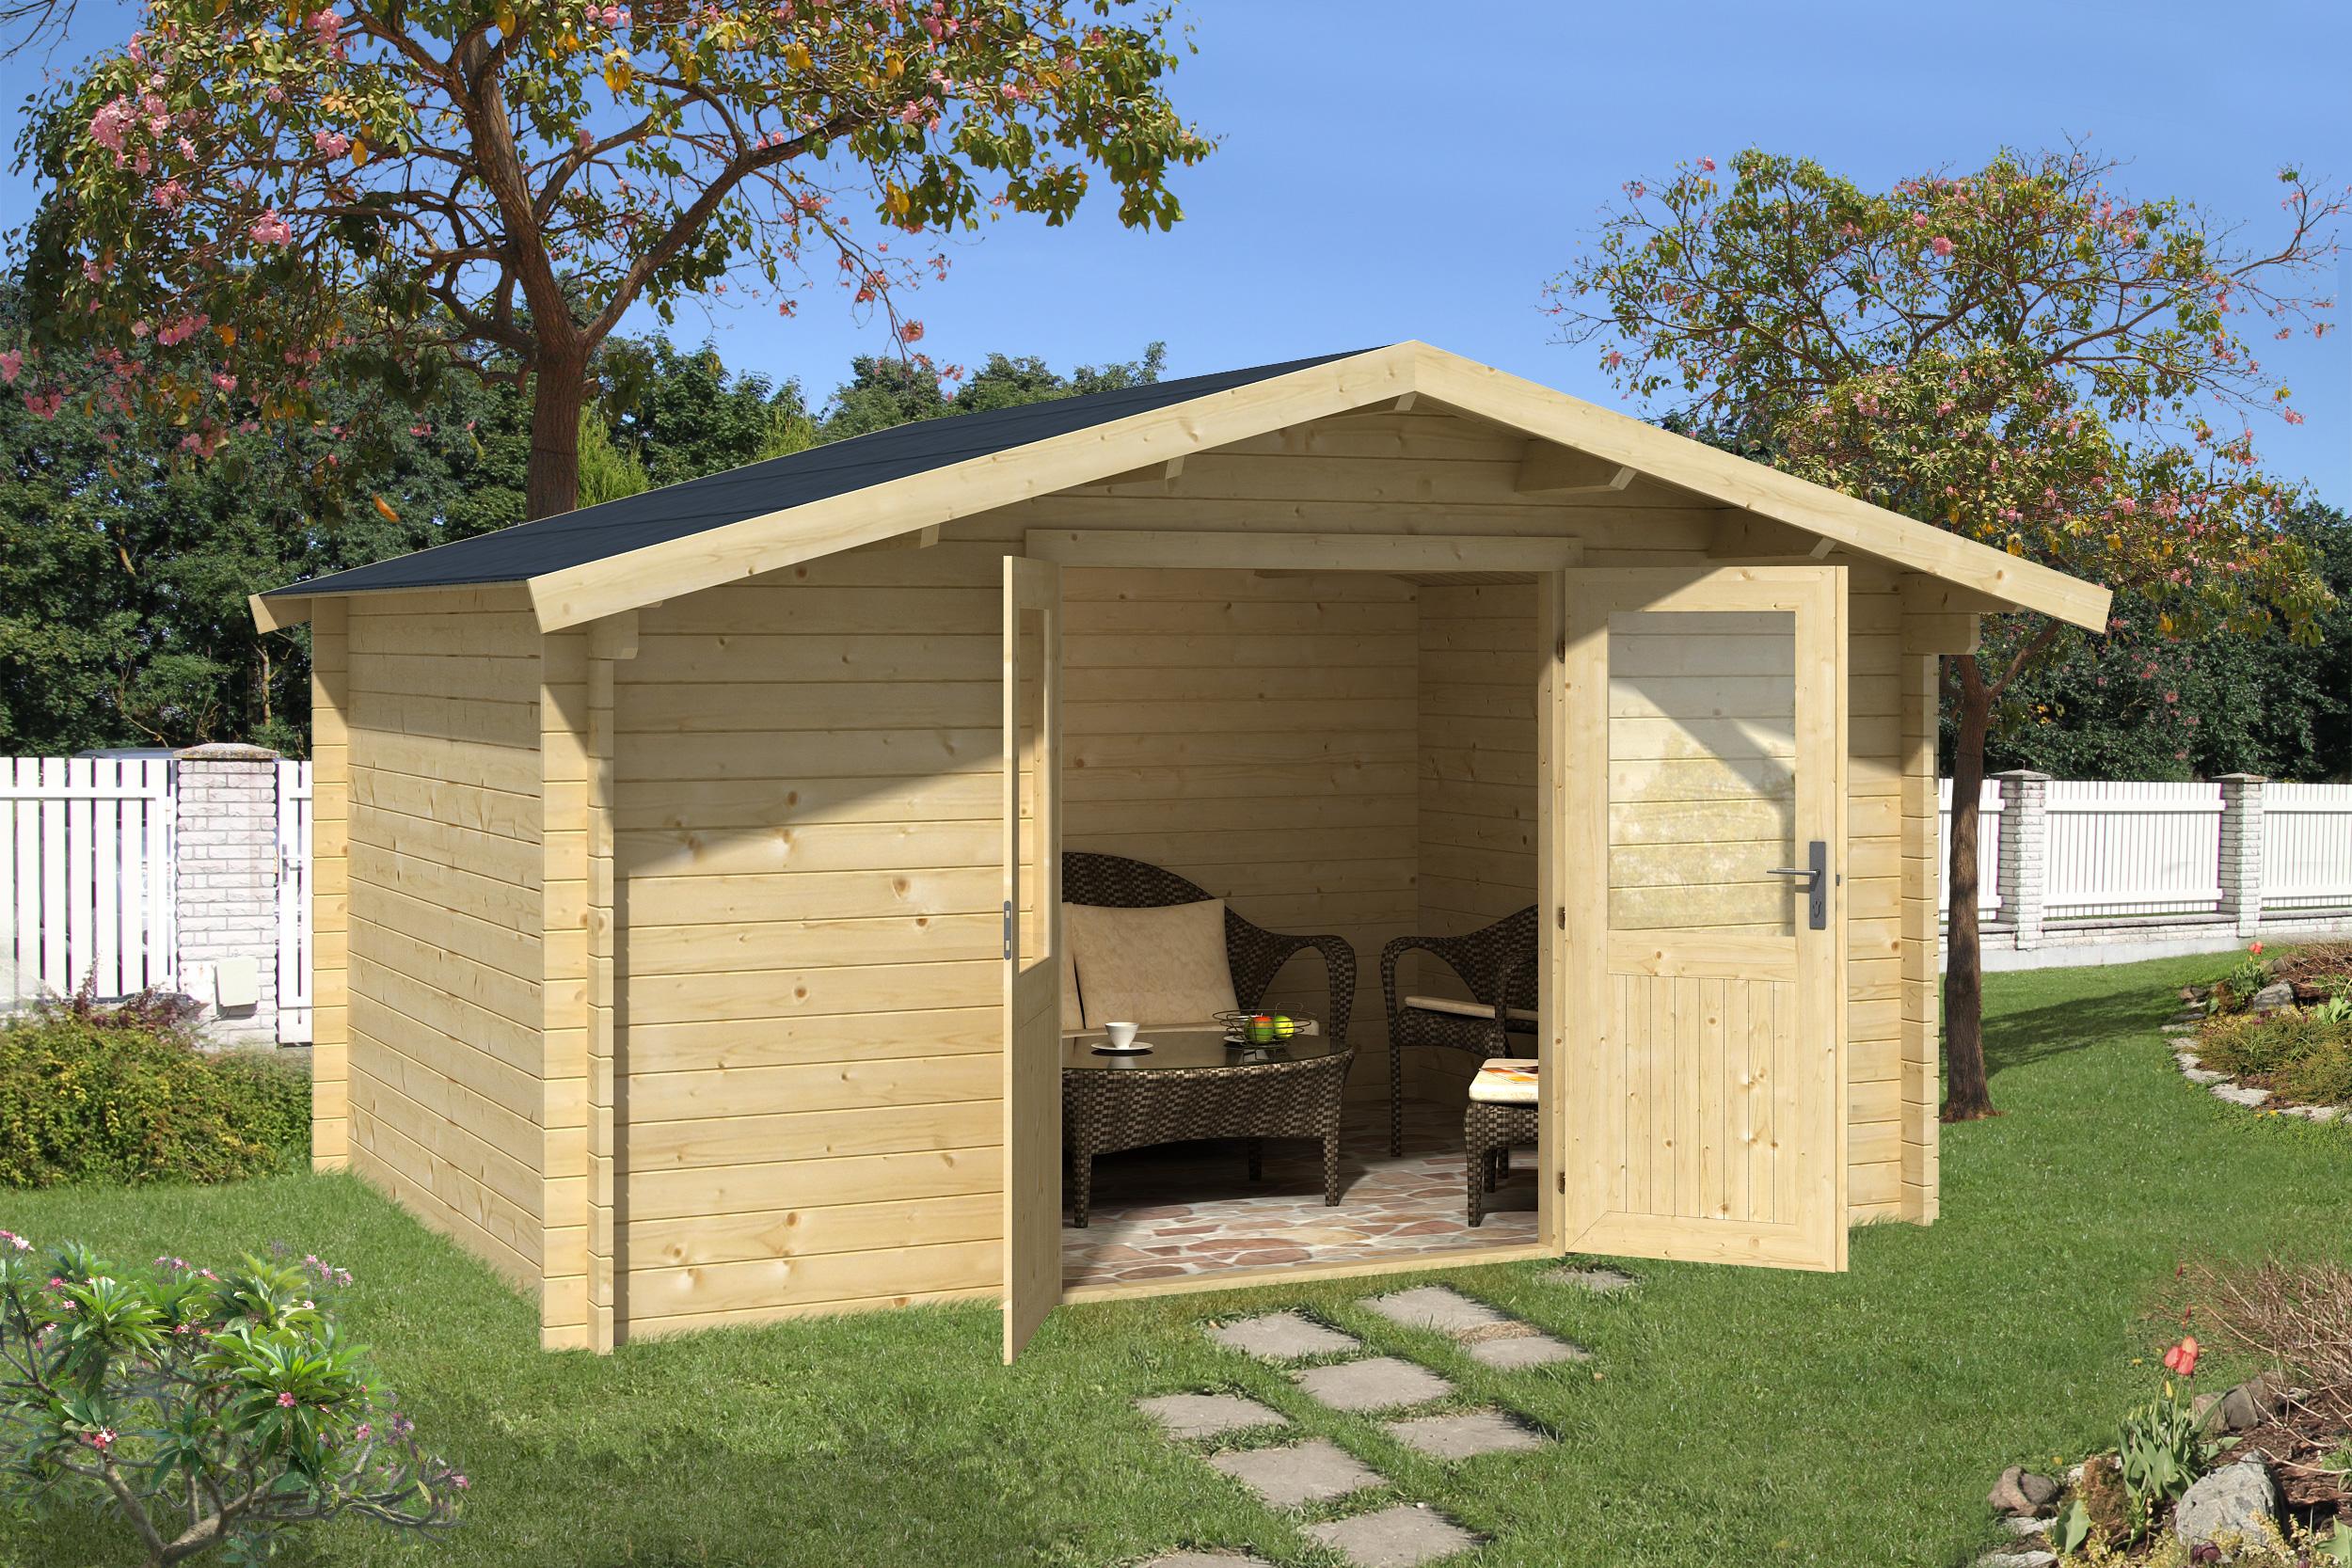 gartenhaus leipzig f 34 mm ca 400x300 cm holzwurm obersayn. Black Bedroom Furniture Sets. Home Design Ideas